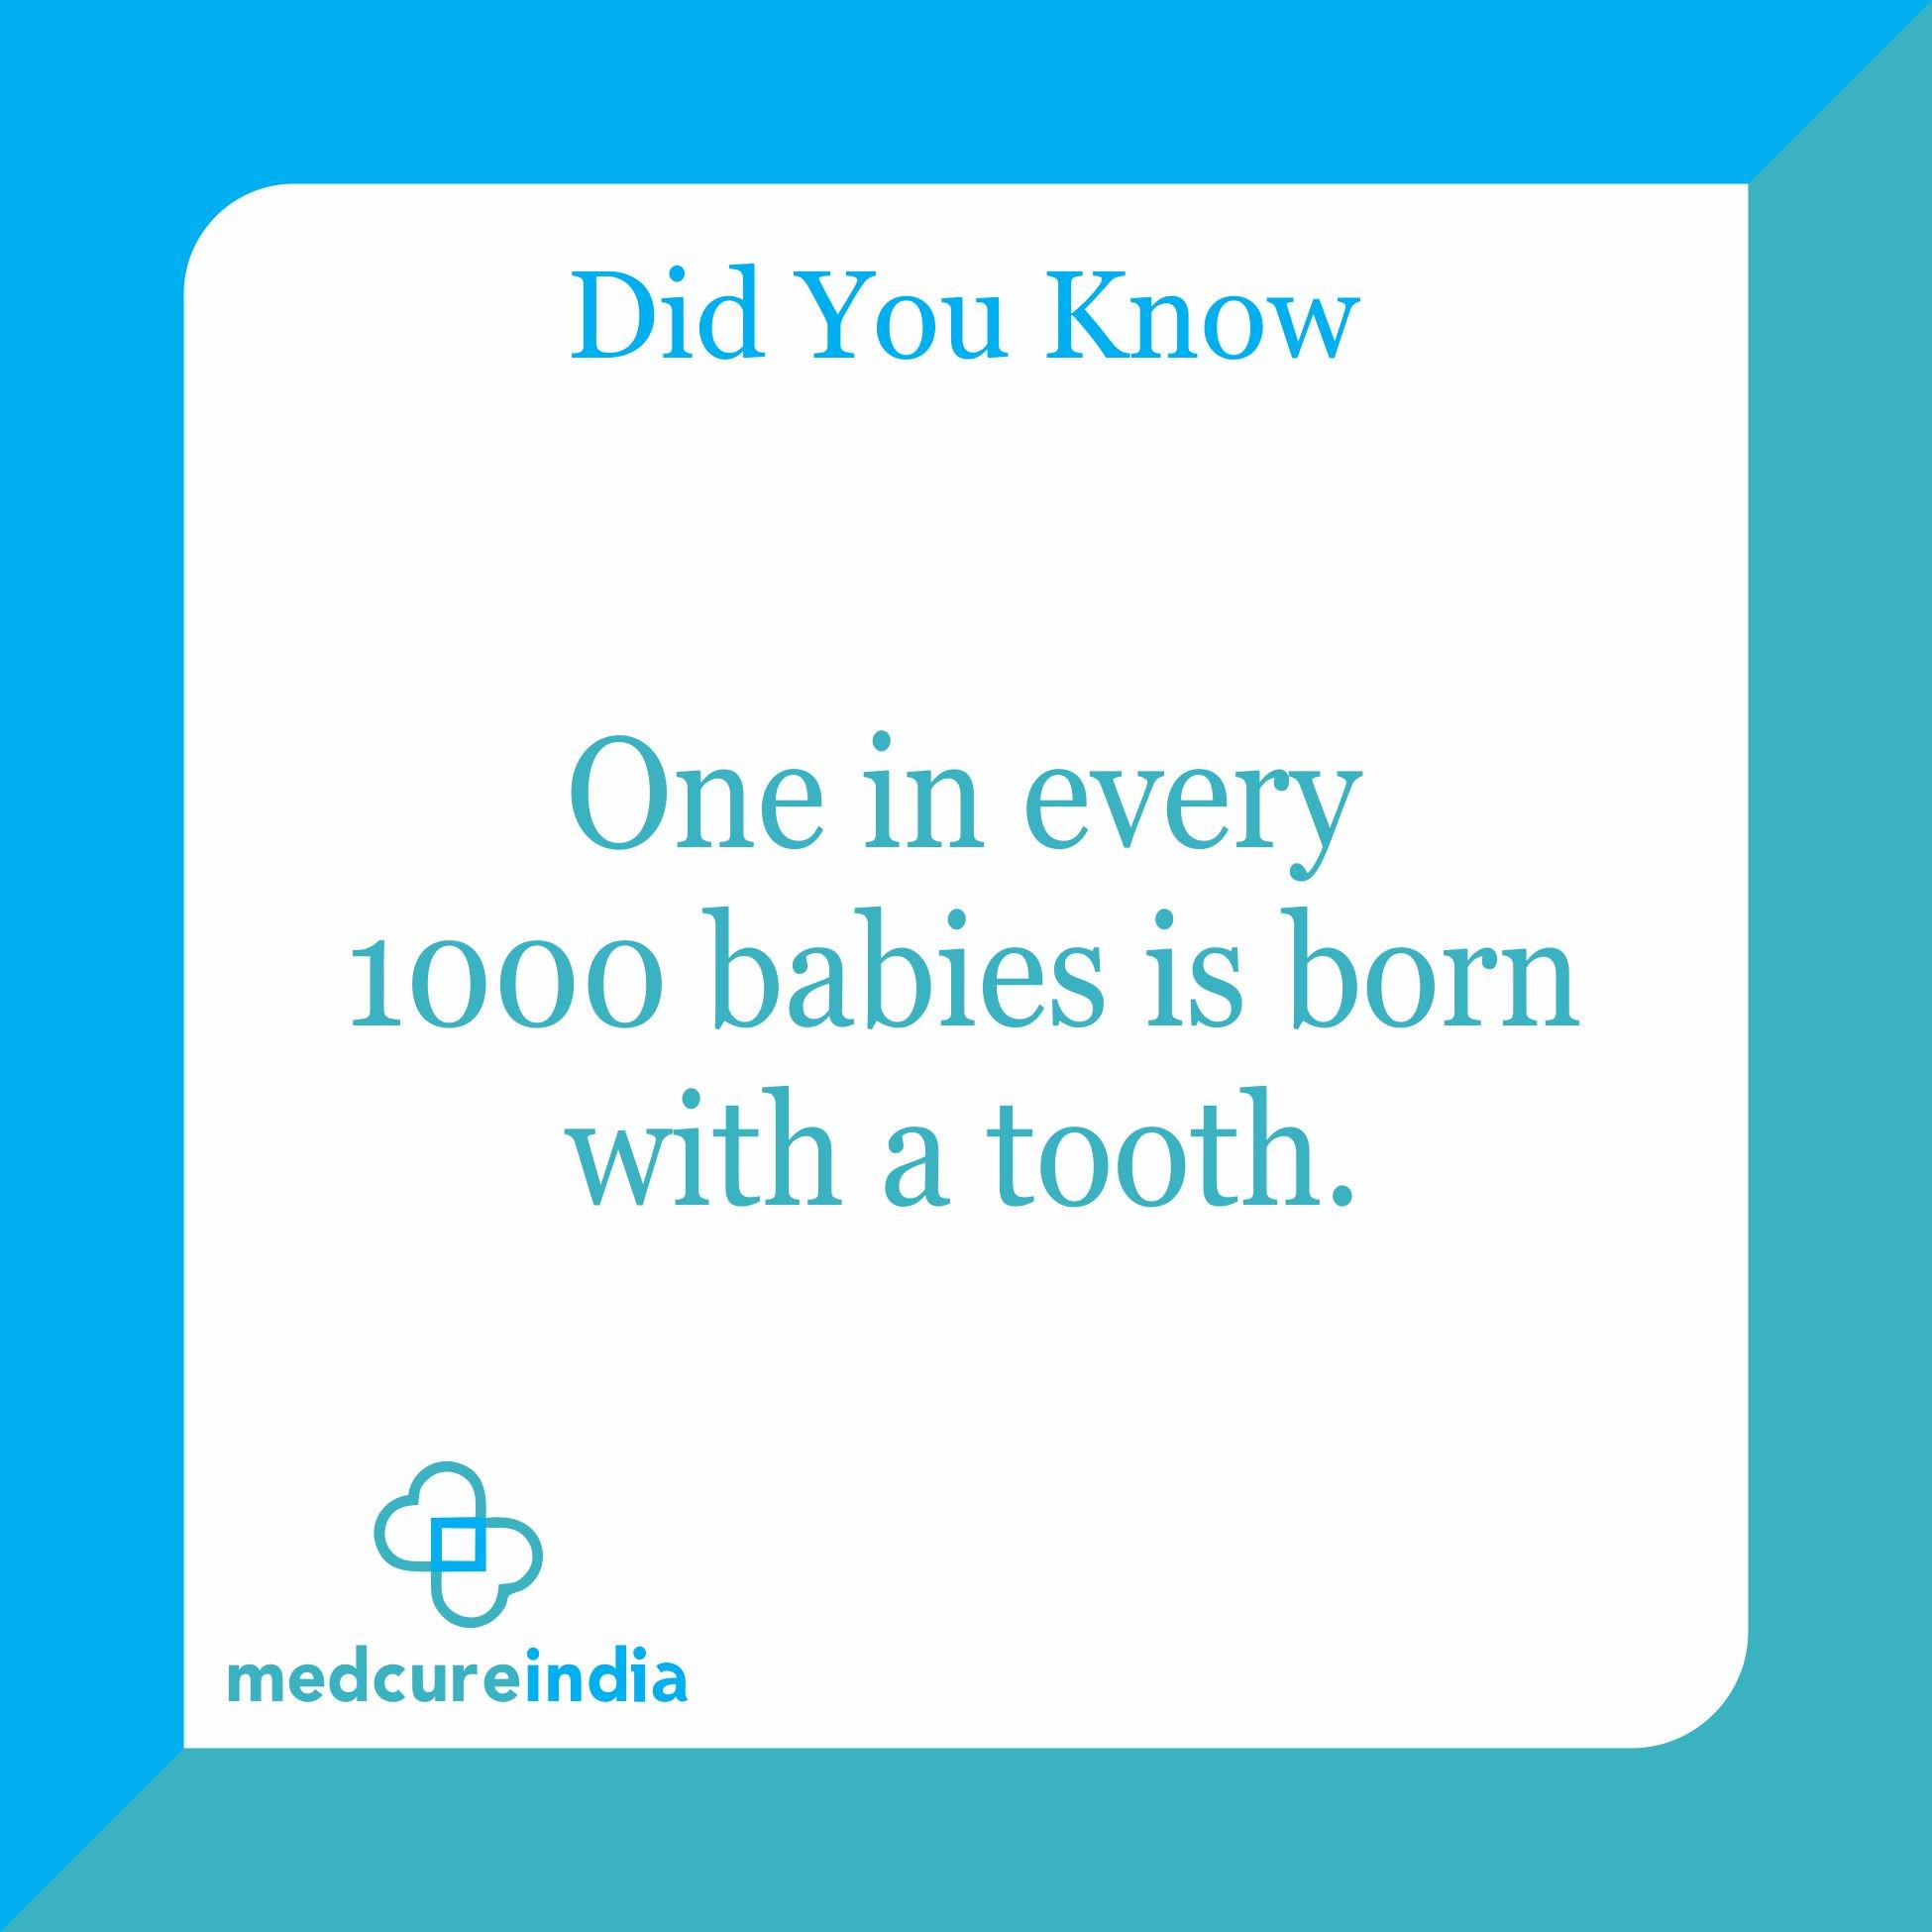 #DidyouKnow One in Every 1000 babies is born with a #tooth.  #medcureindia #hospital #WednesdayWisdom #WorldDayAgainstChildLabour #rainbow #dental #peditric #COSMETICS #thailand #usa #Tanzania #Ghana #Kenya #Africa #africangirl #africangirls #dentalhygiene https://t.co/Je5xB8M4pY